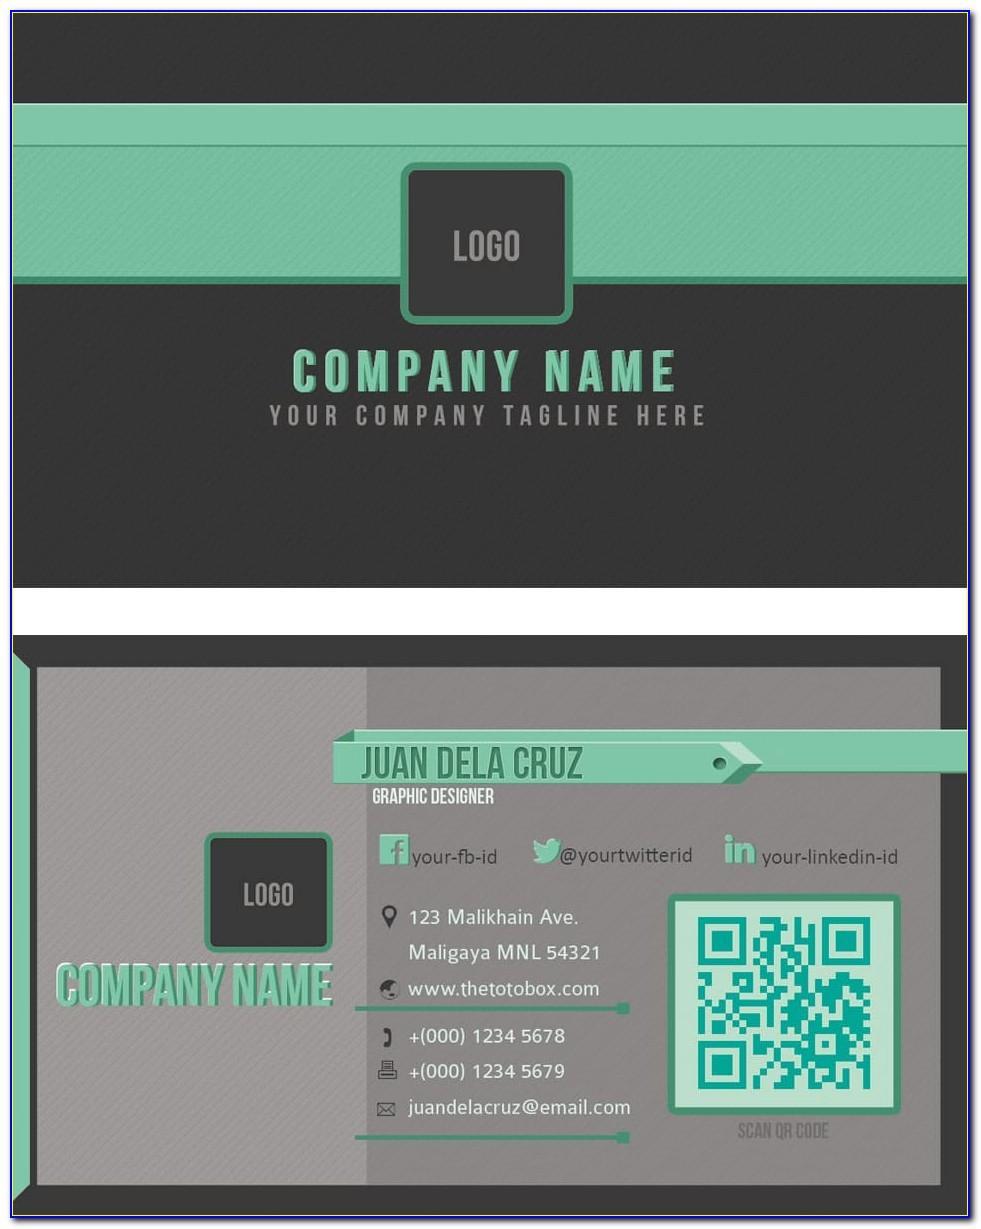 Vistaprint Business Card Template Indesign